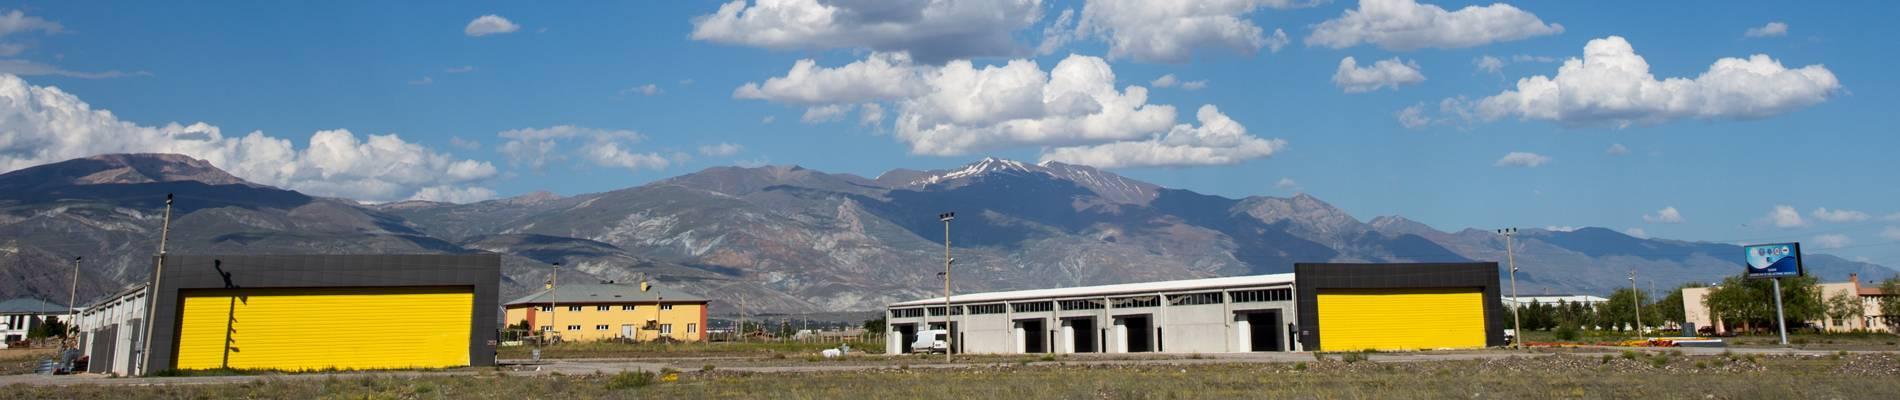 Erzincan İş Geliştirme Merkezi